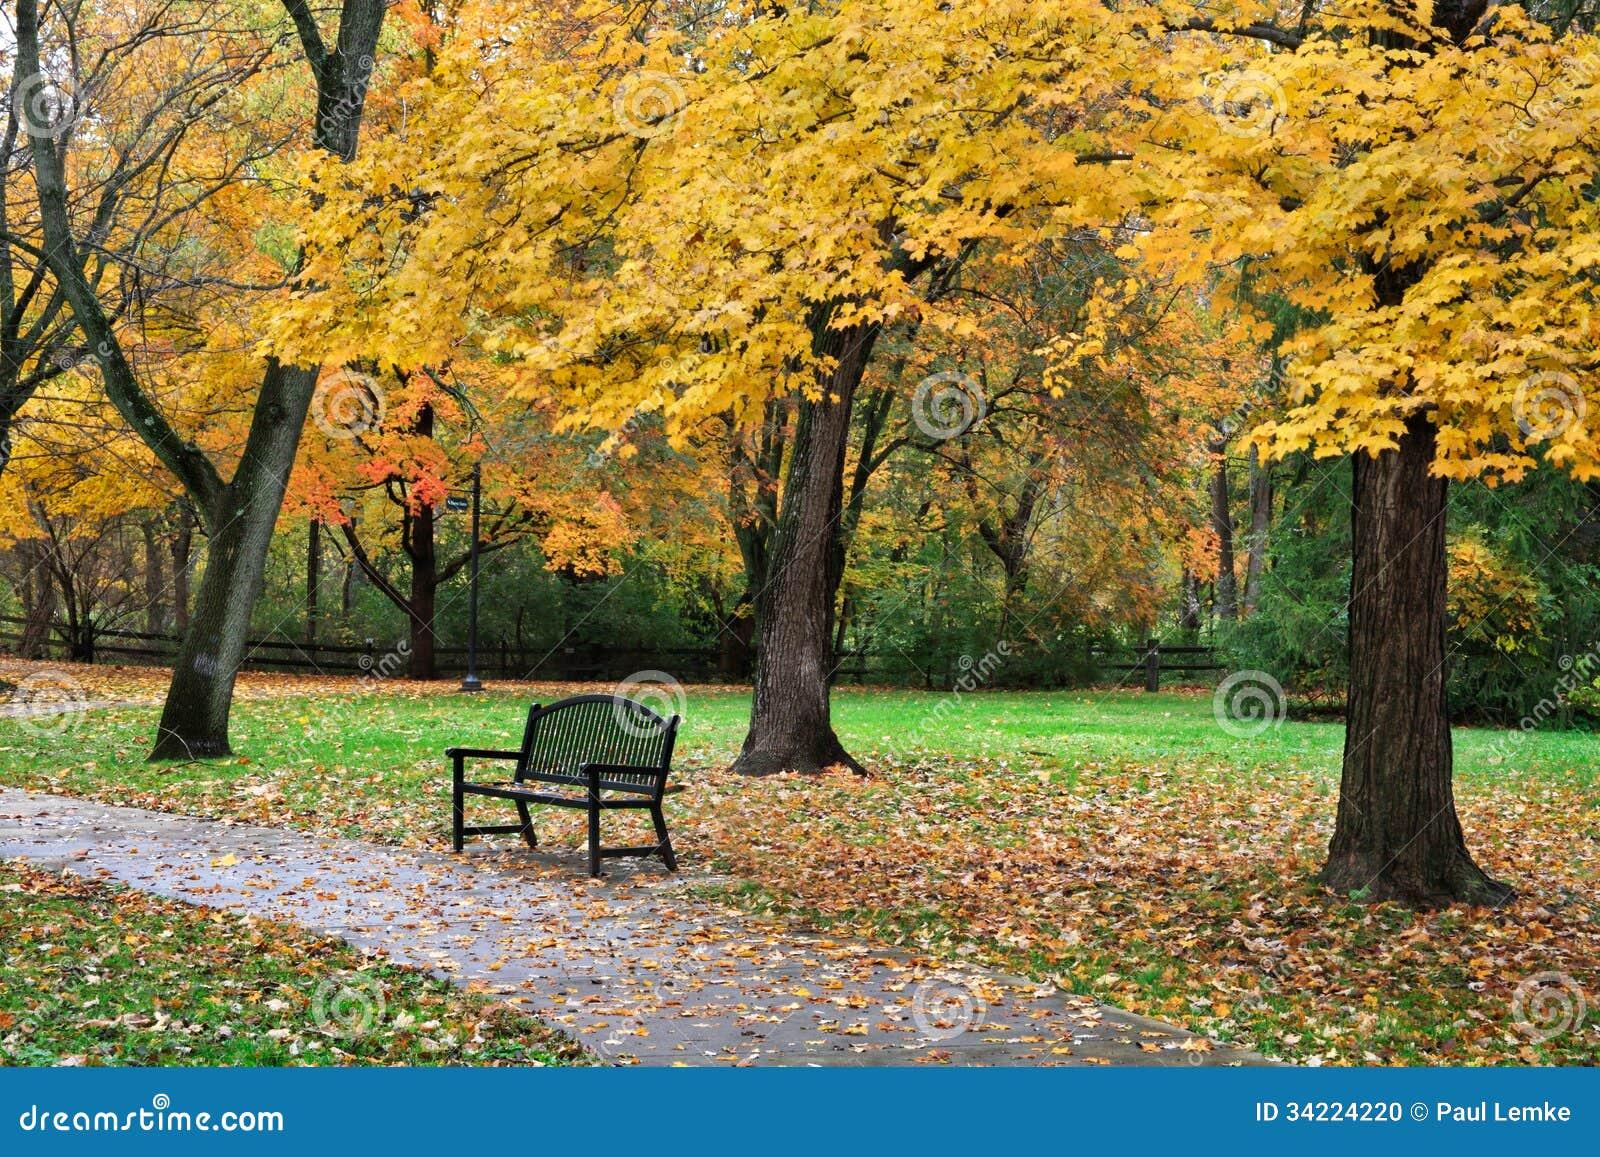 Autumn Park Bench Stock Photo - Image: 34224220